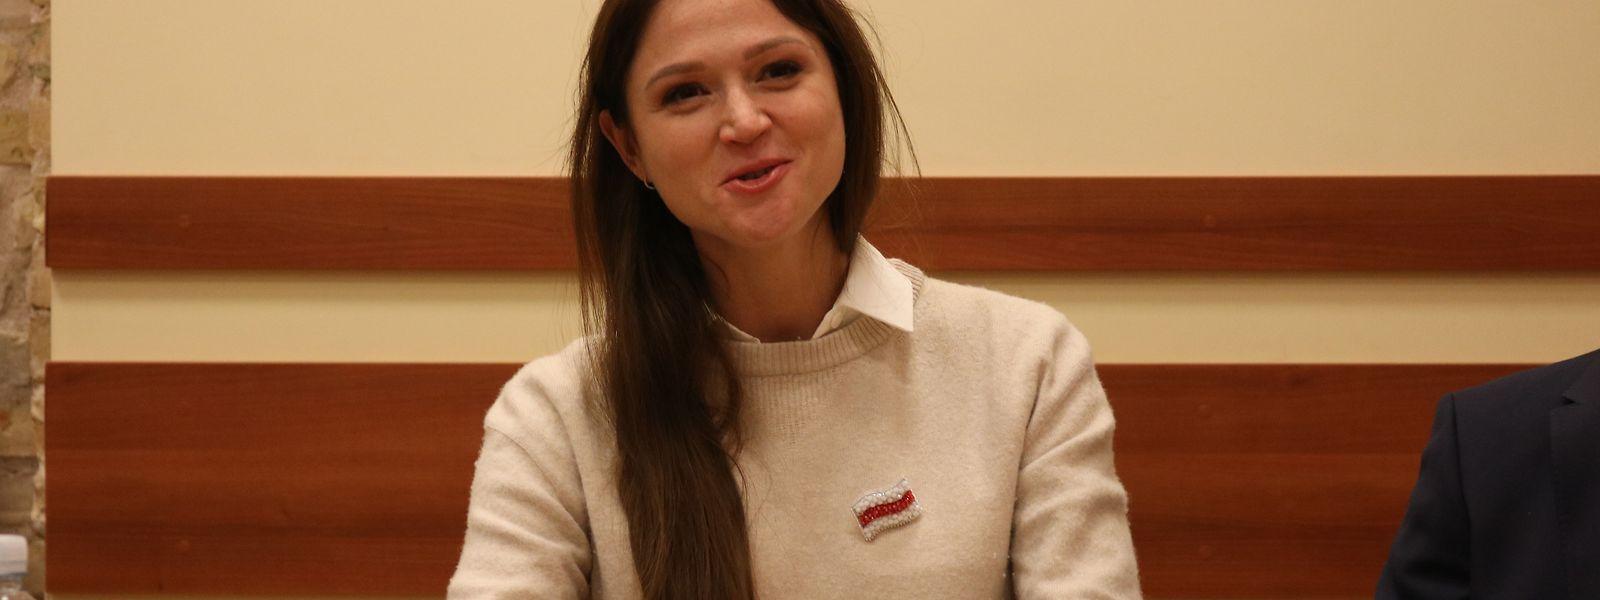 Alexandra Gerassimenja stellt sich offen gegen den Machtapparat in Minsk.